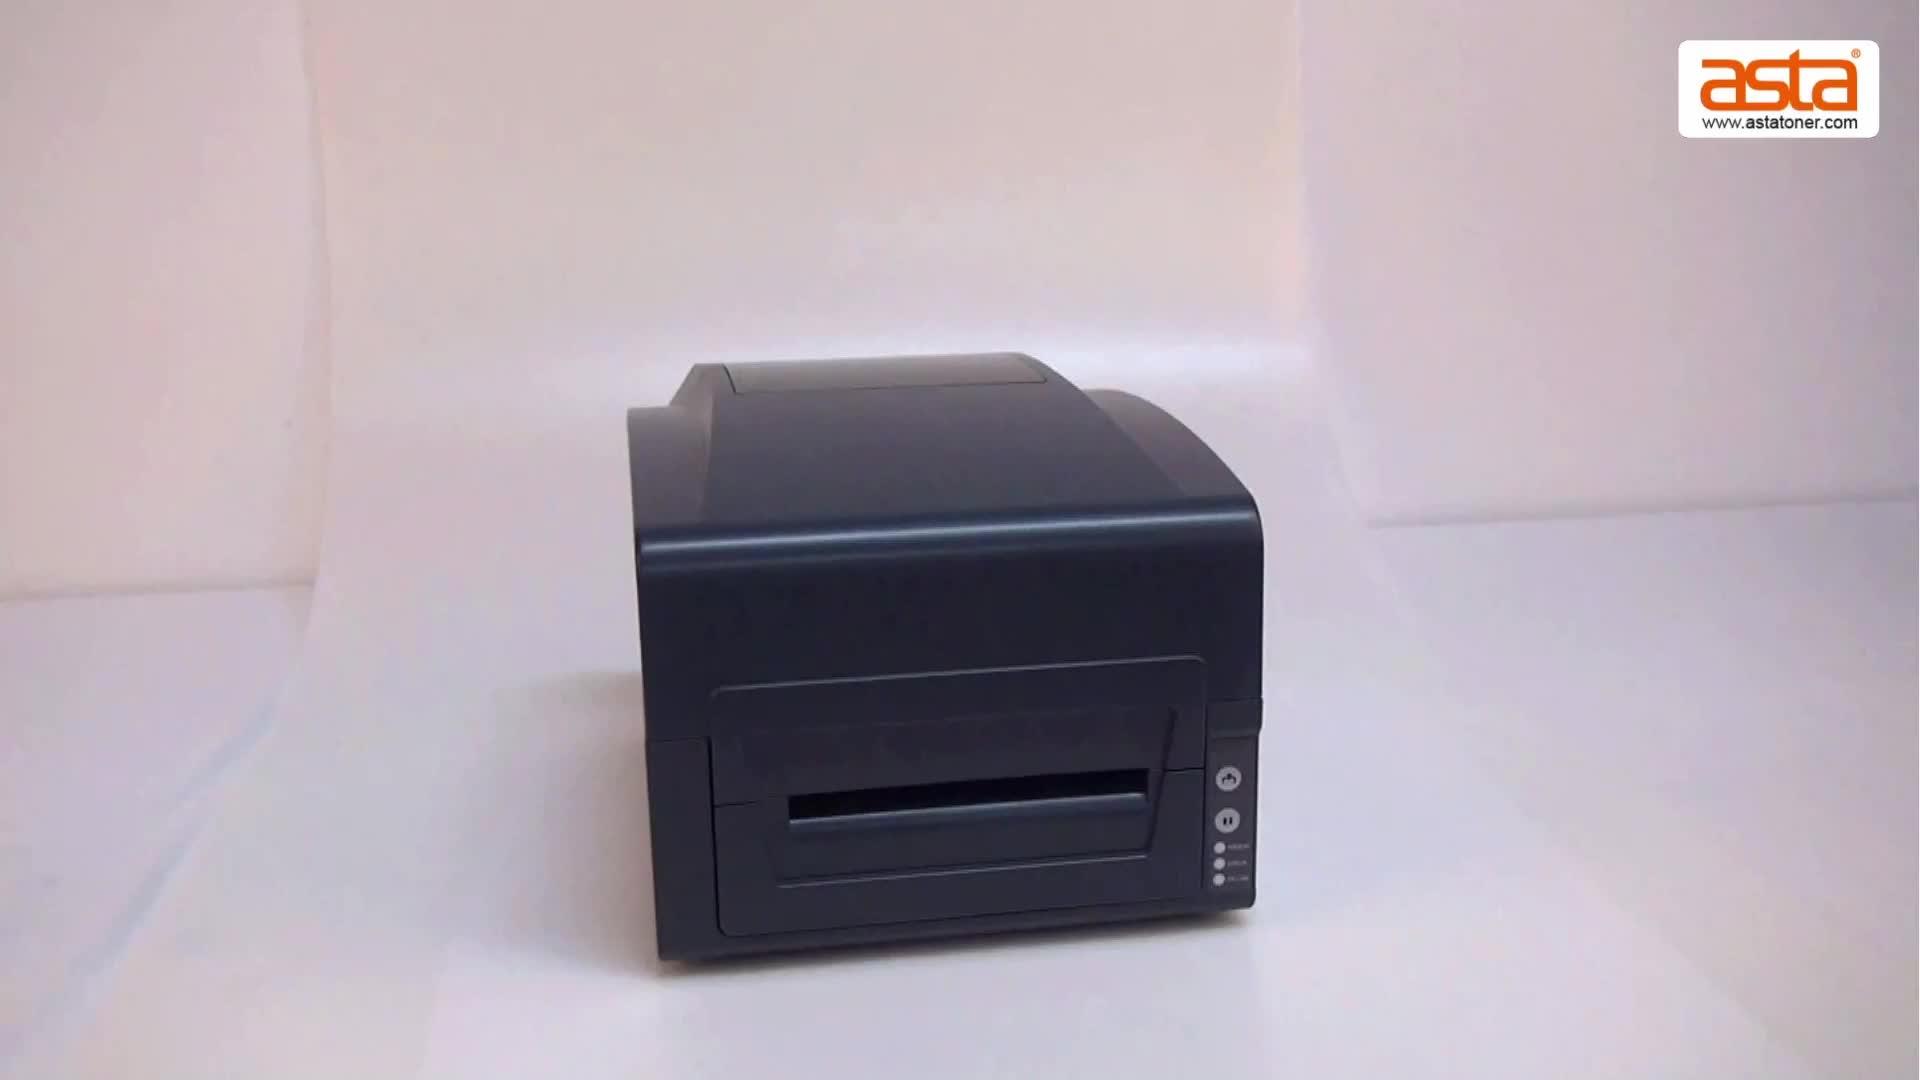 Asta High Quality 6 Inch Thermal Transfer Printer Sticker Label Printer